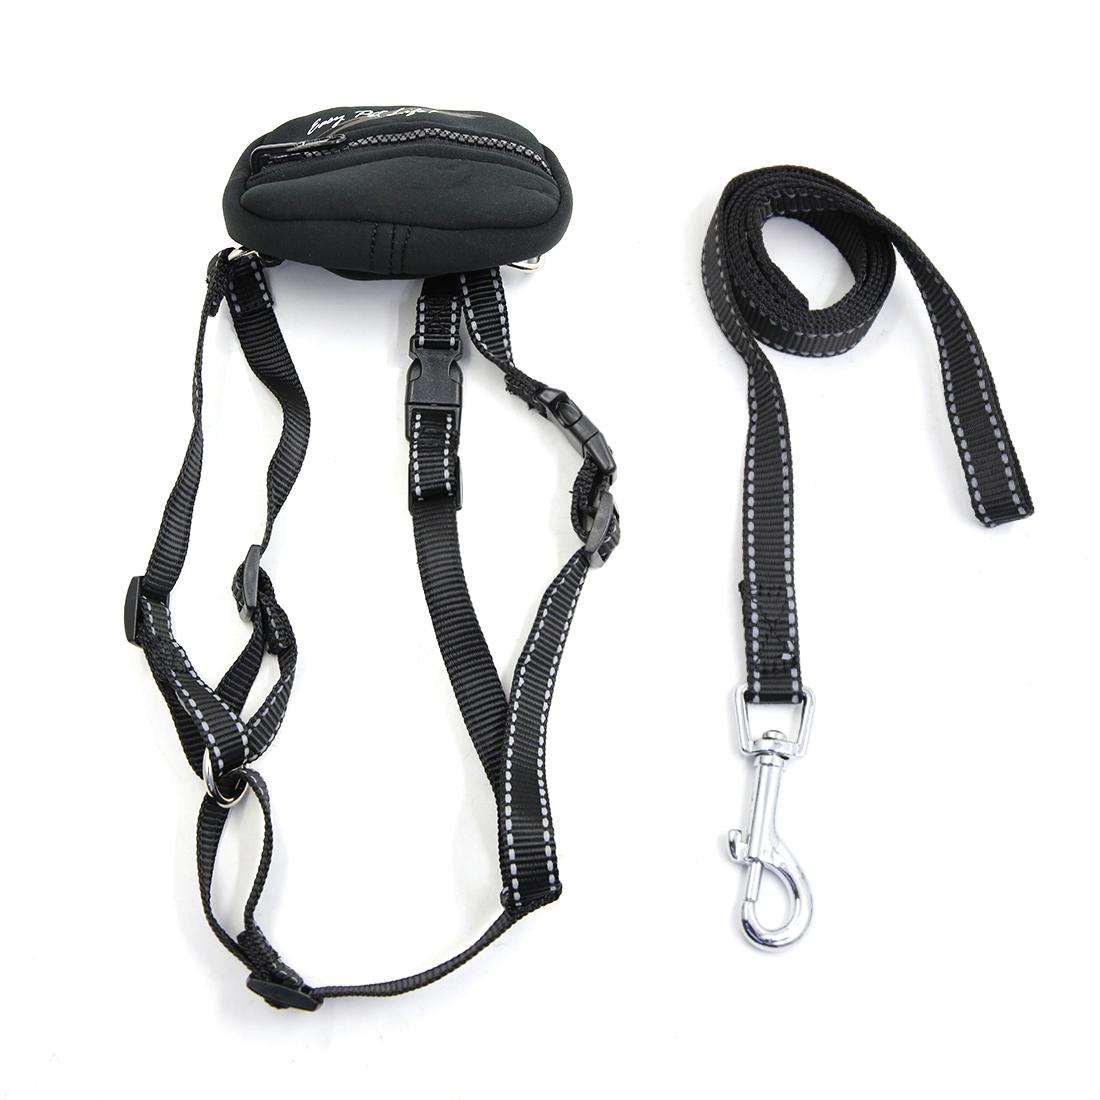 Safe Reflective Dog Harness Leash Adjustable Nylon Collar For Walking with Storage Bag Black XL